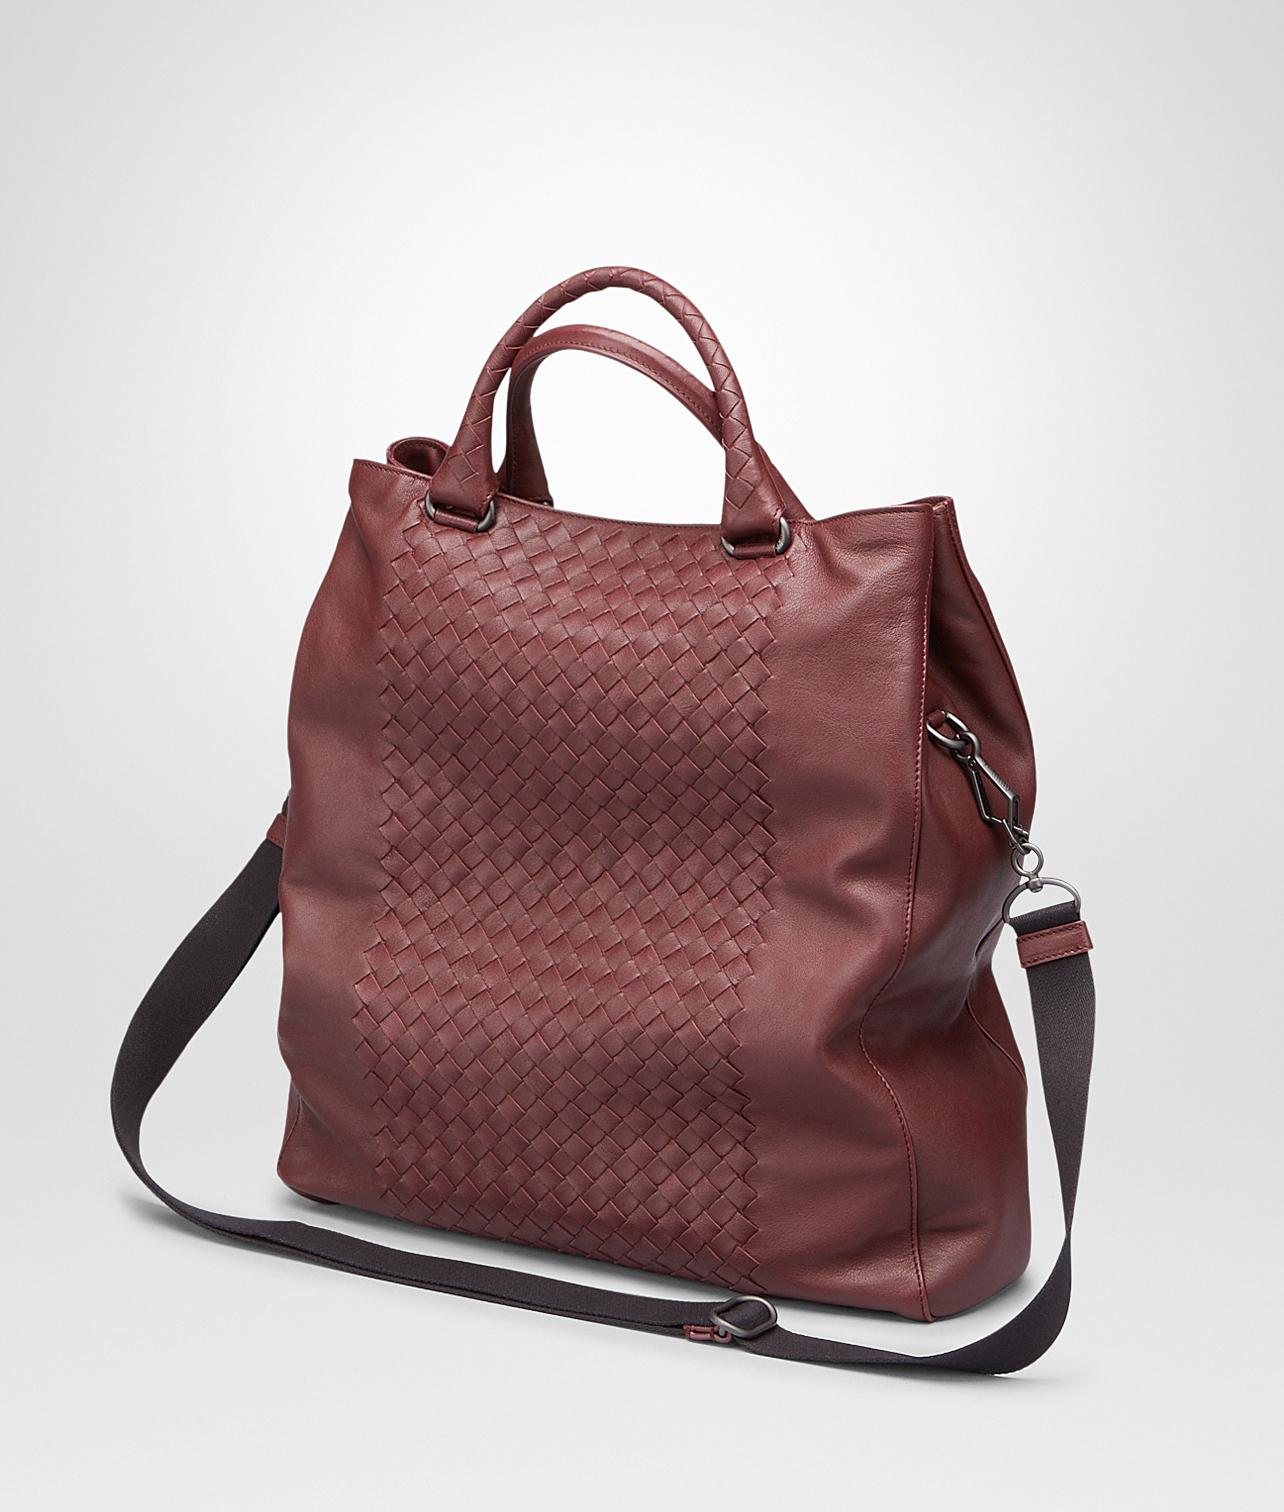 82af3bcc9a94c Bottega Veneta Aubergine Nero Intrecciato Washed Nappa Tote Bag in ...